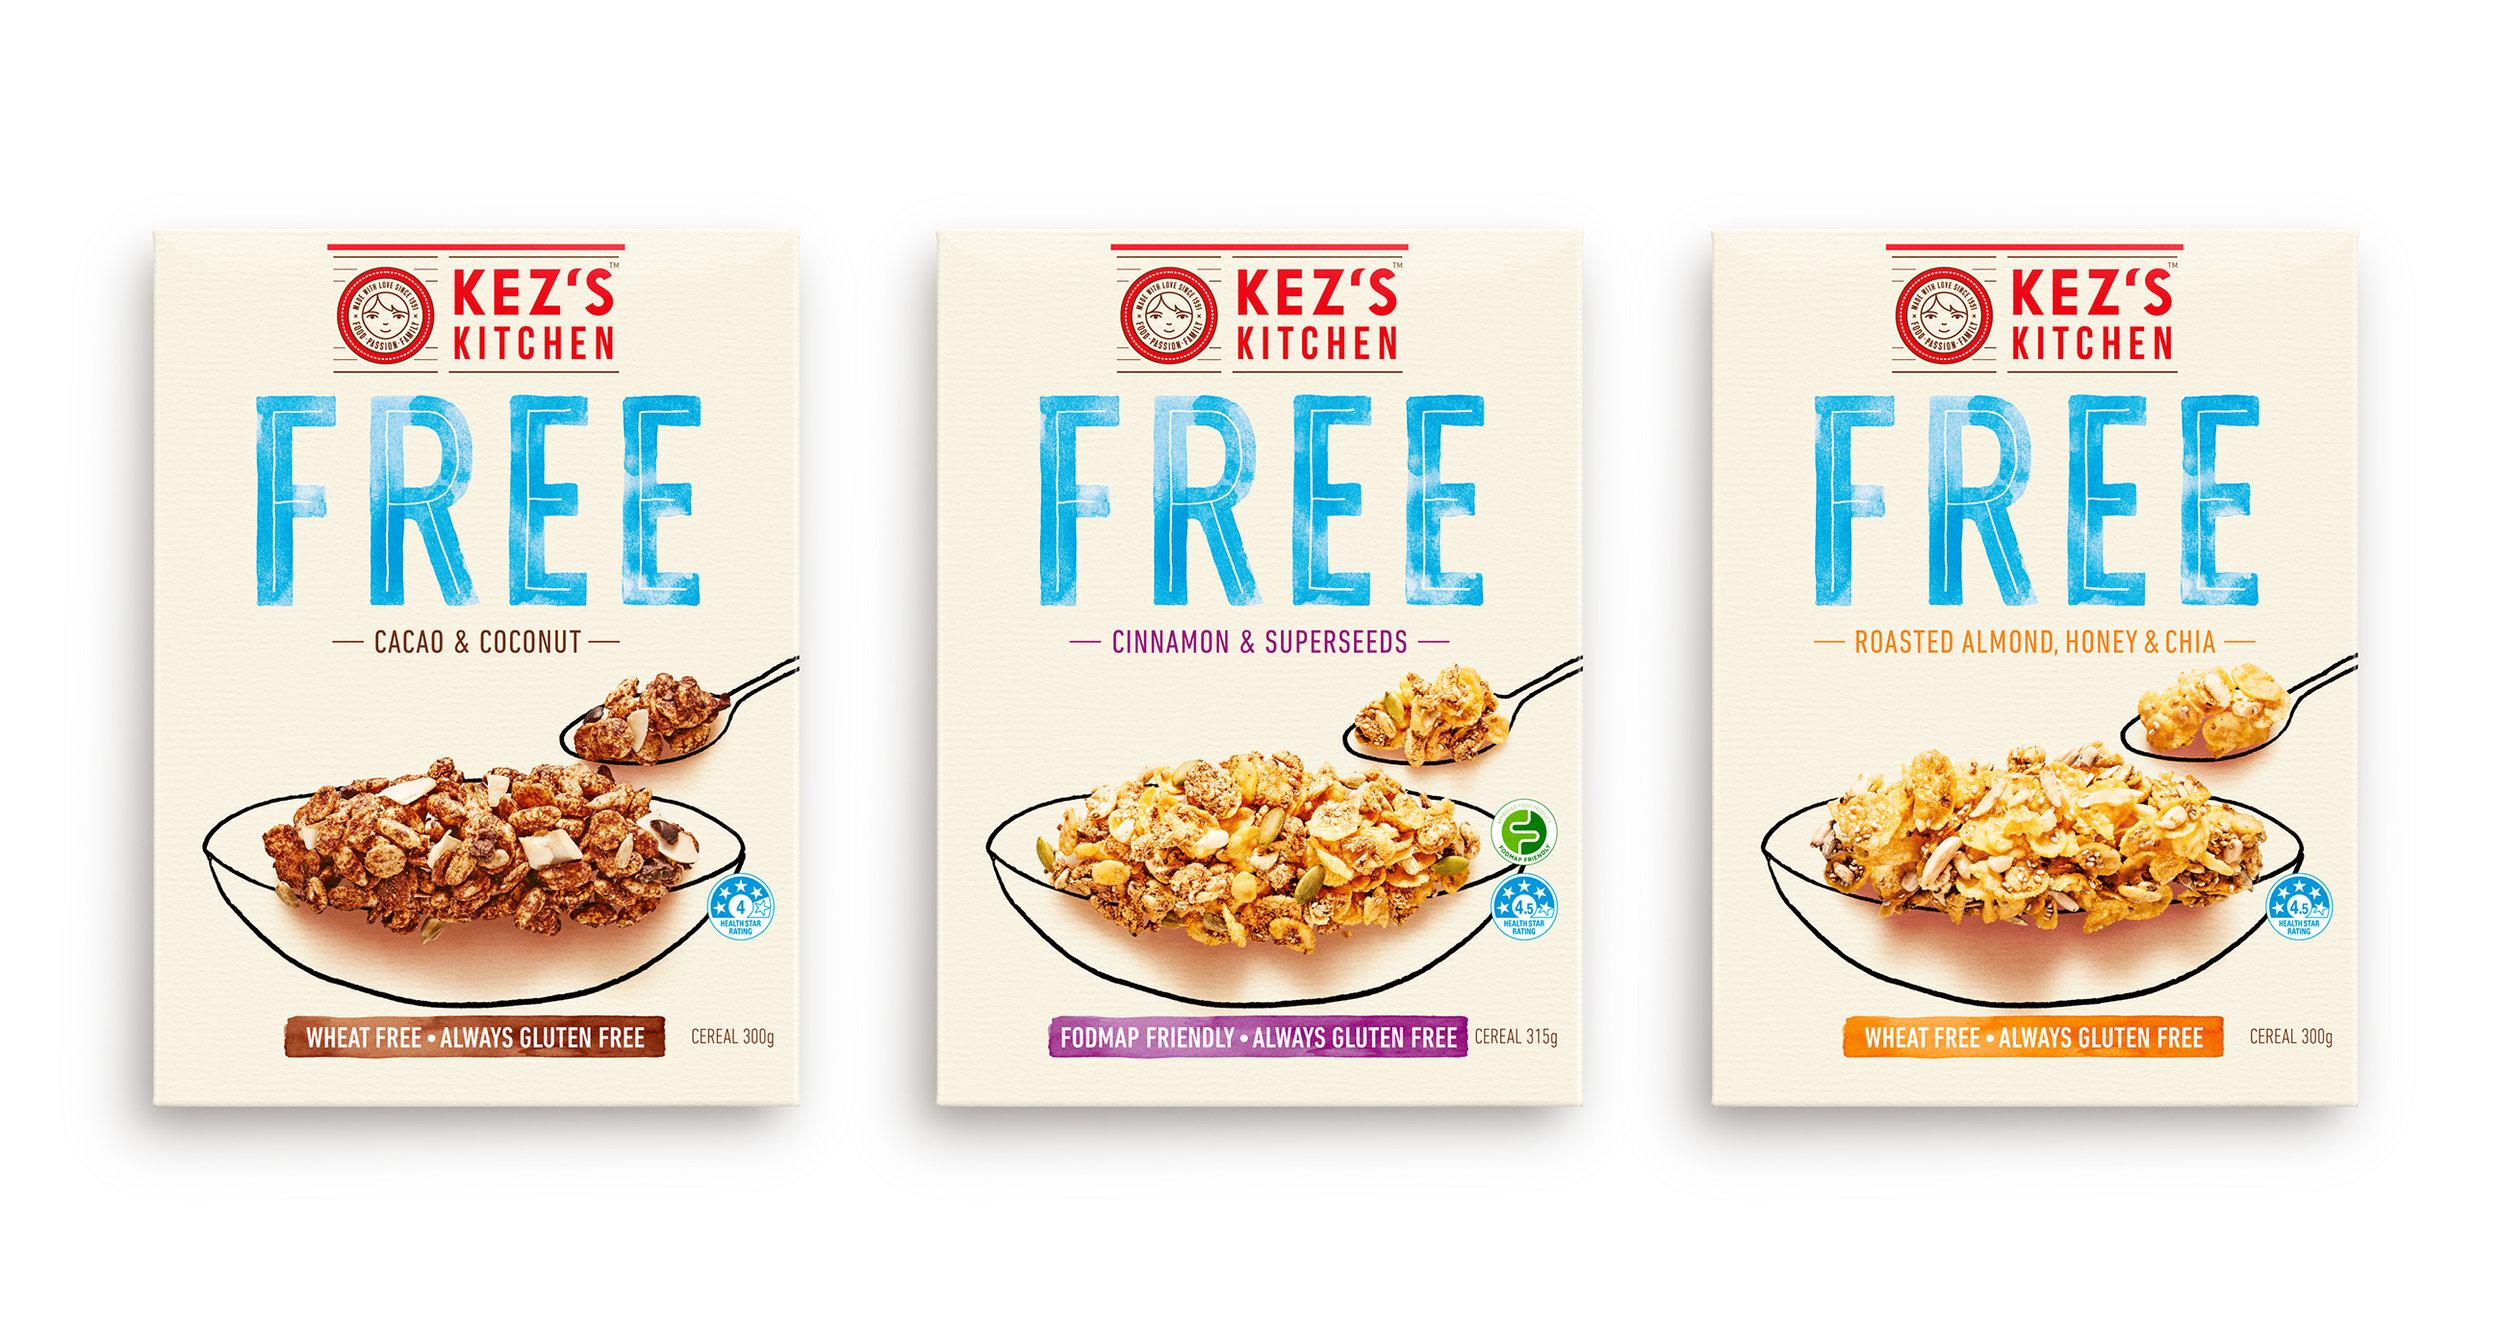 Kezs-Free-Cereal.jpg